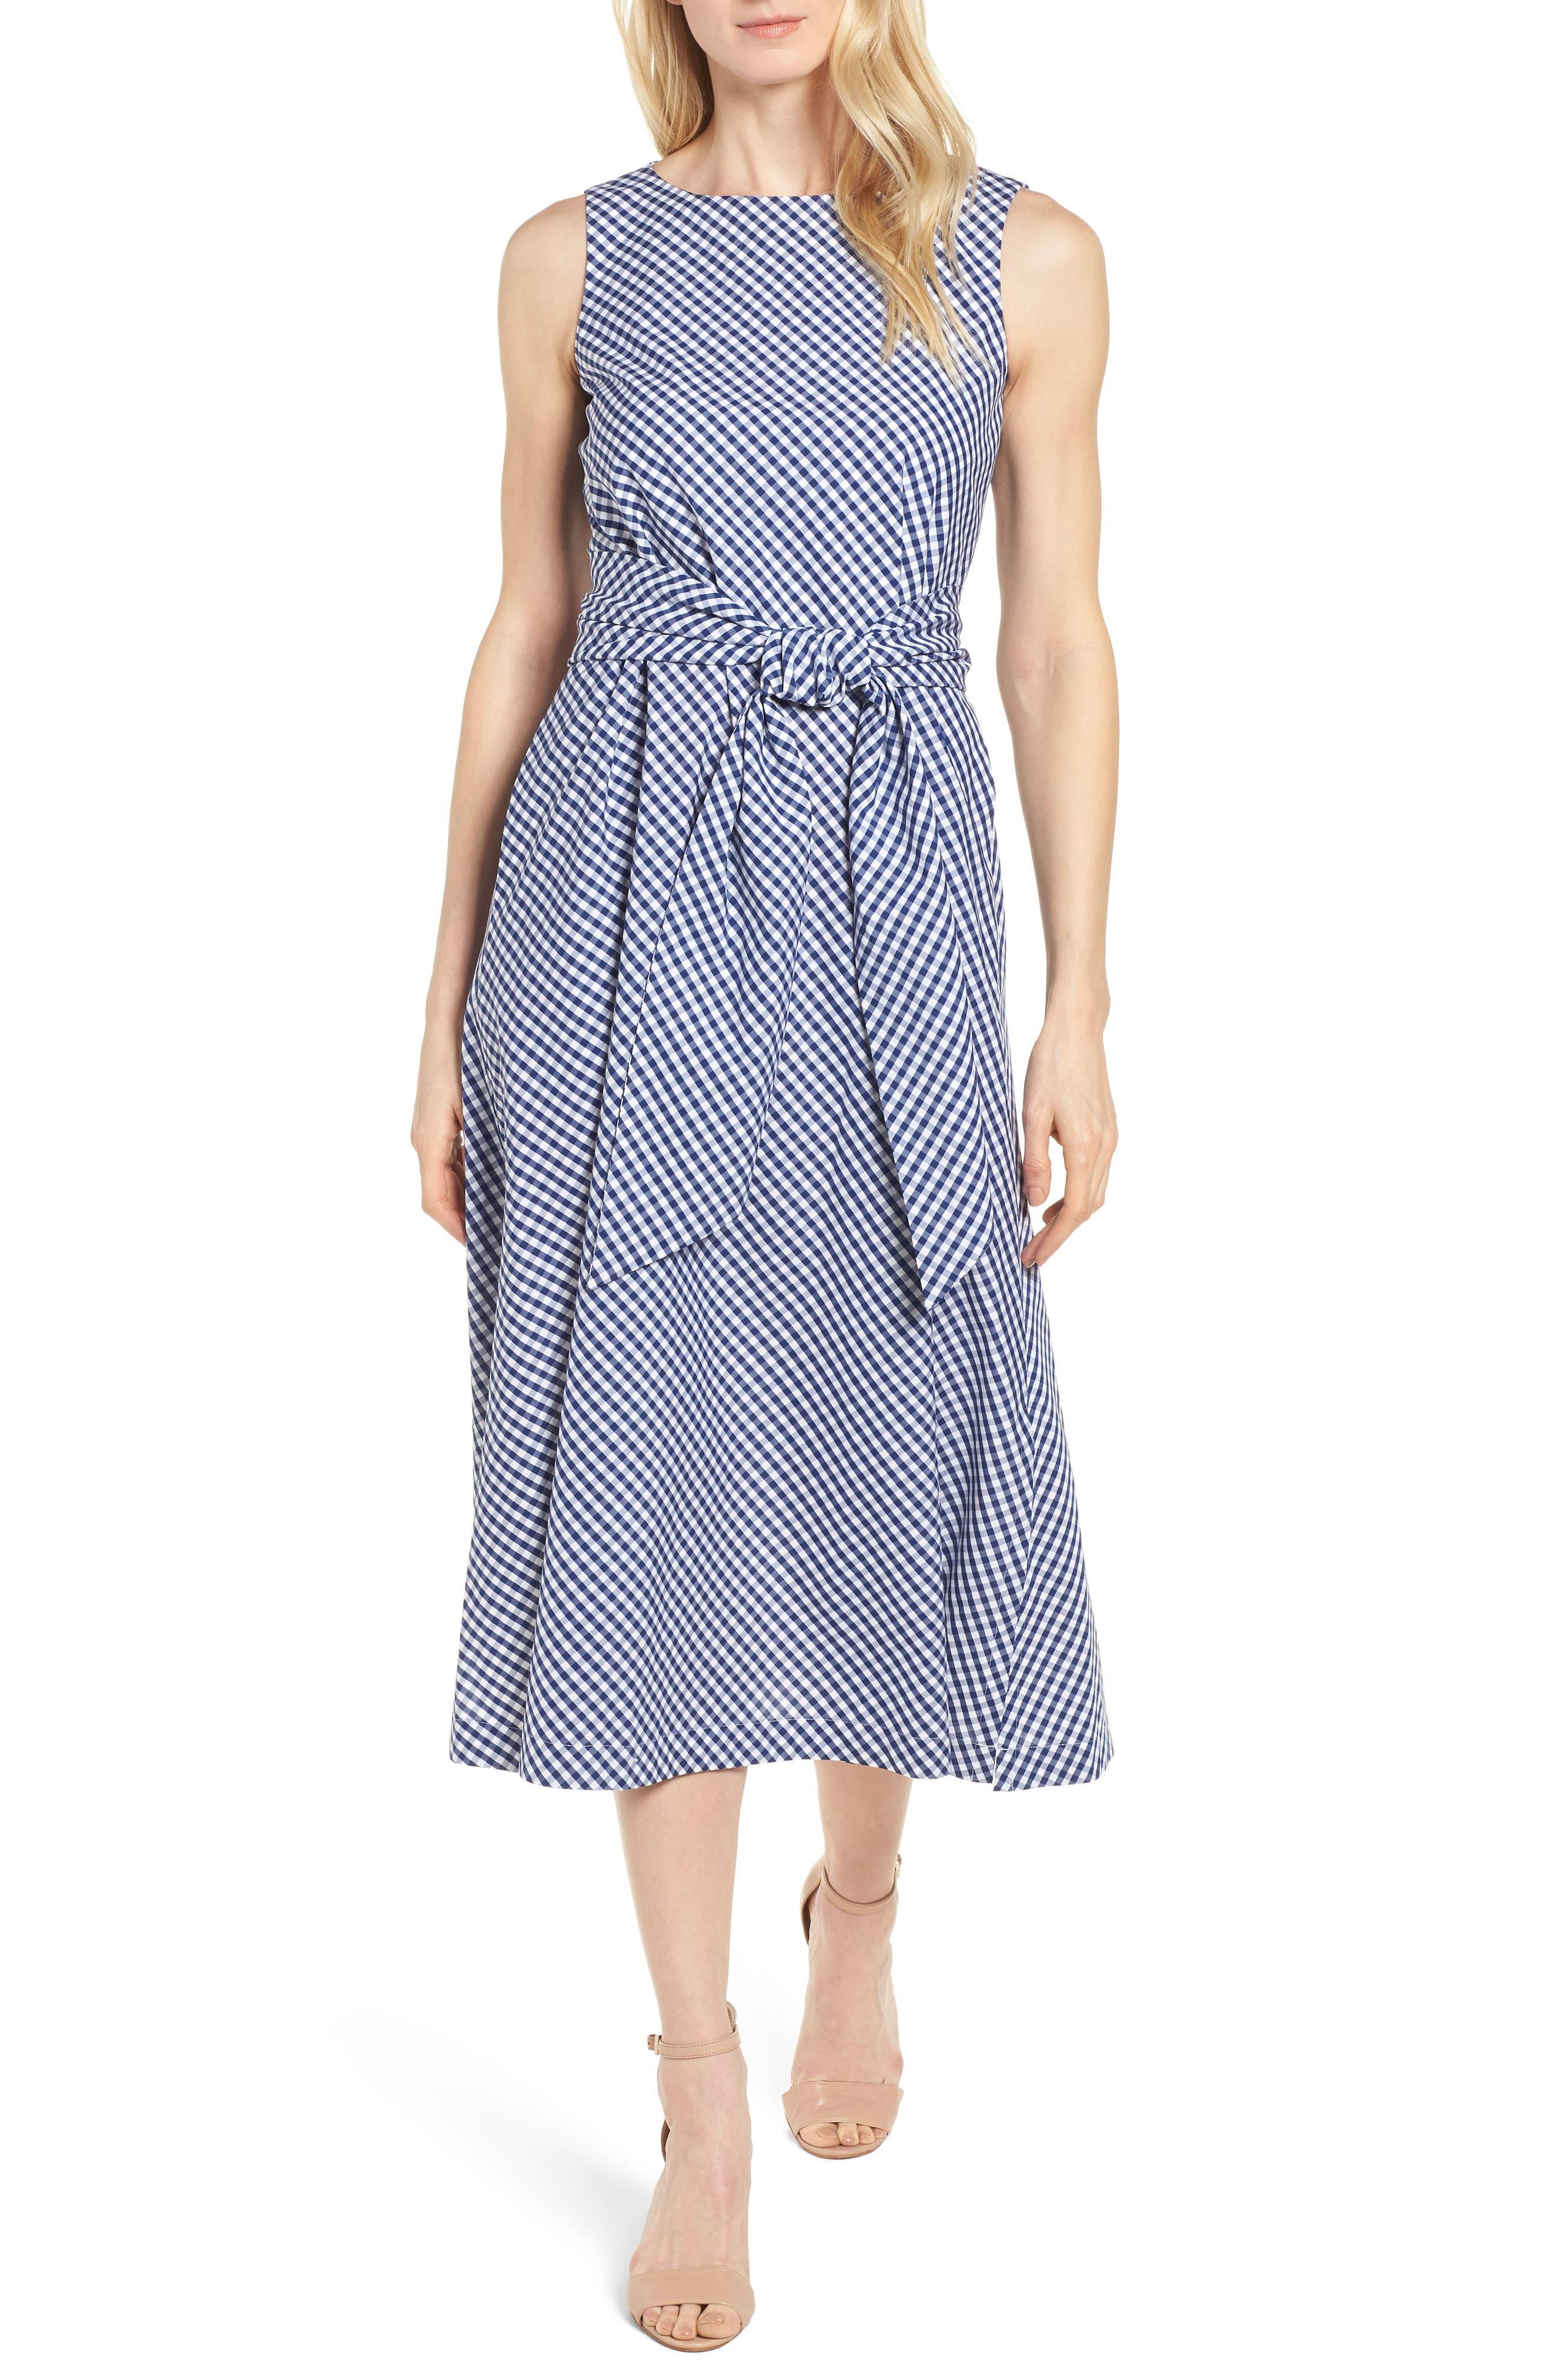 Cotton Gingham Midi Dress,                         Main,                         color, 400